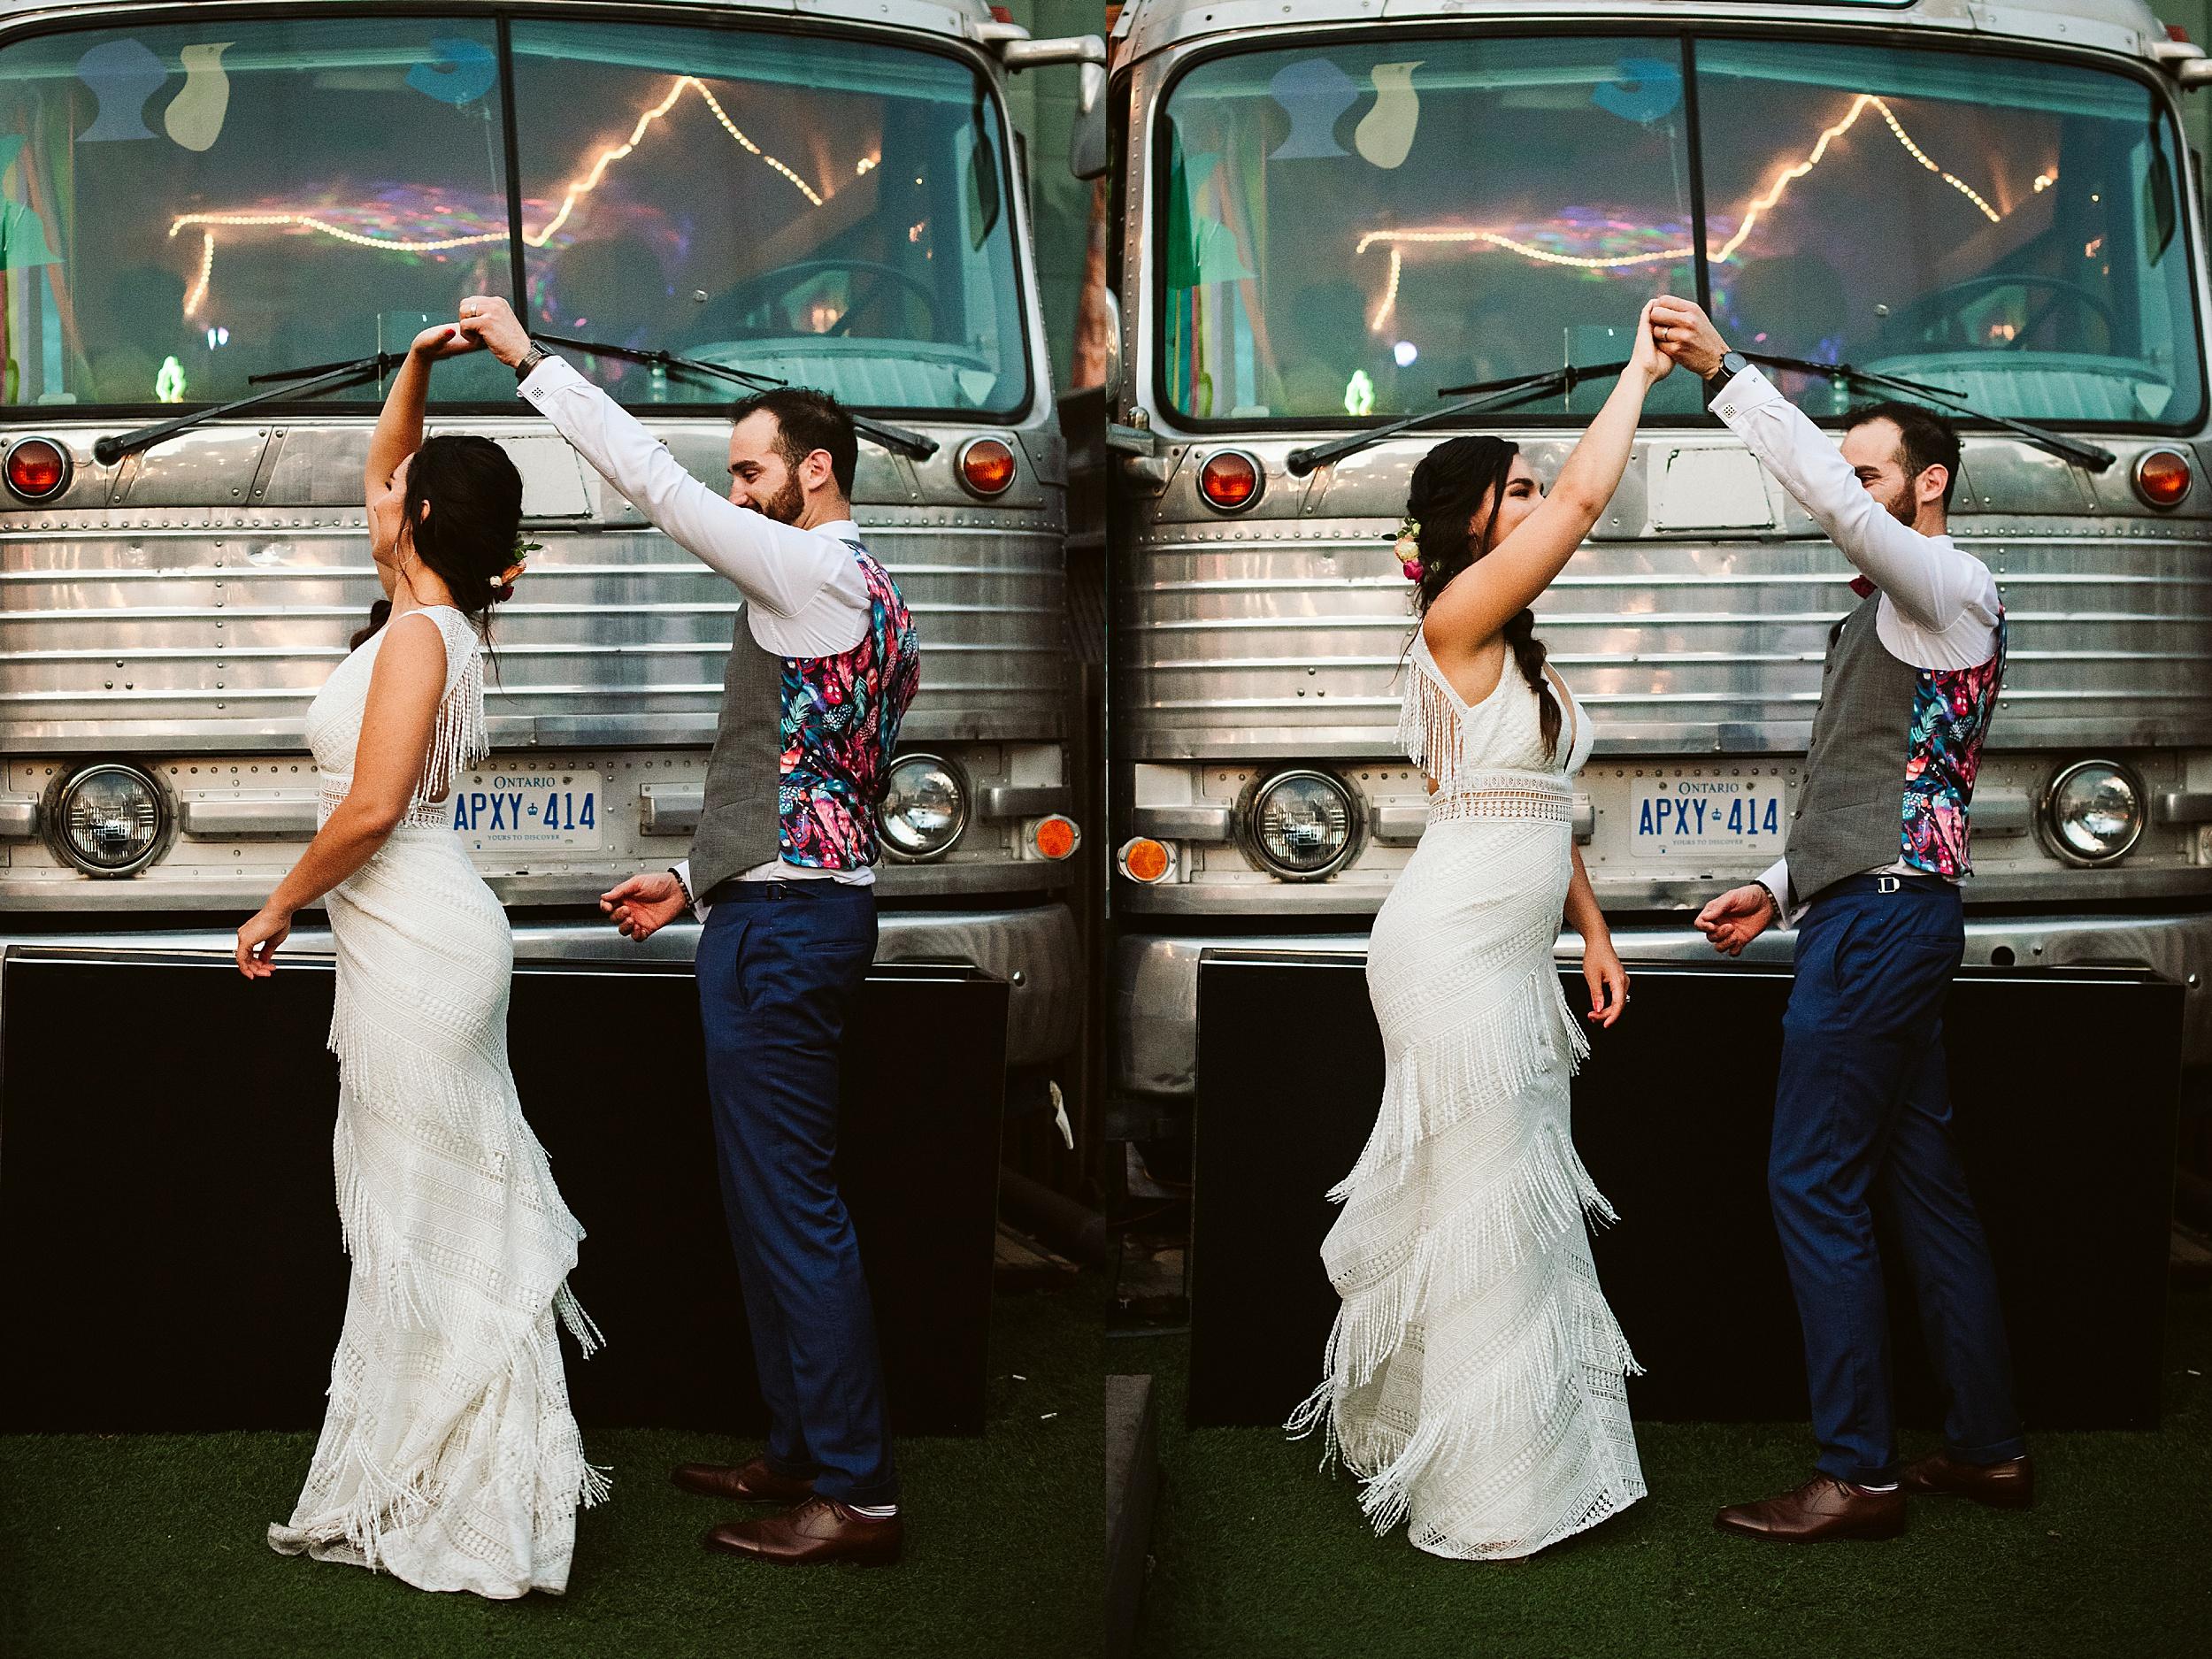 Airship-37-Berkeley-Events-Distillery-District-Wedding-Toronto-Wedding-Photographers_0050.jpg